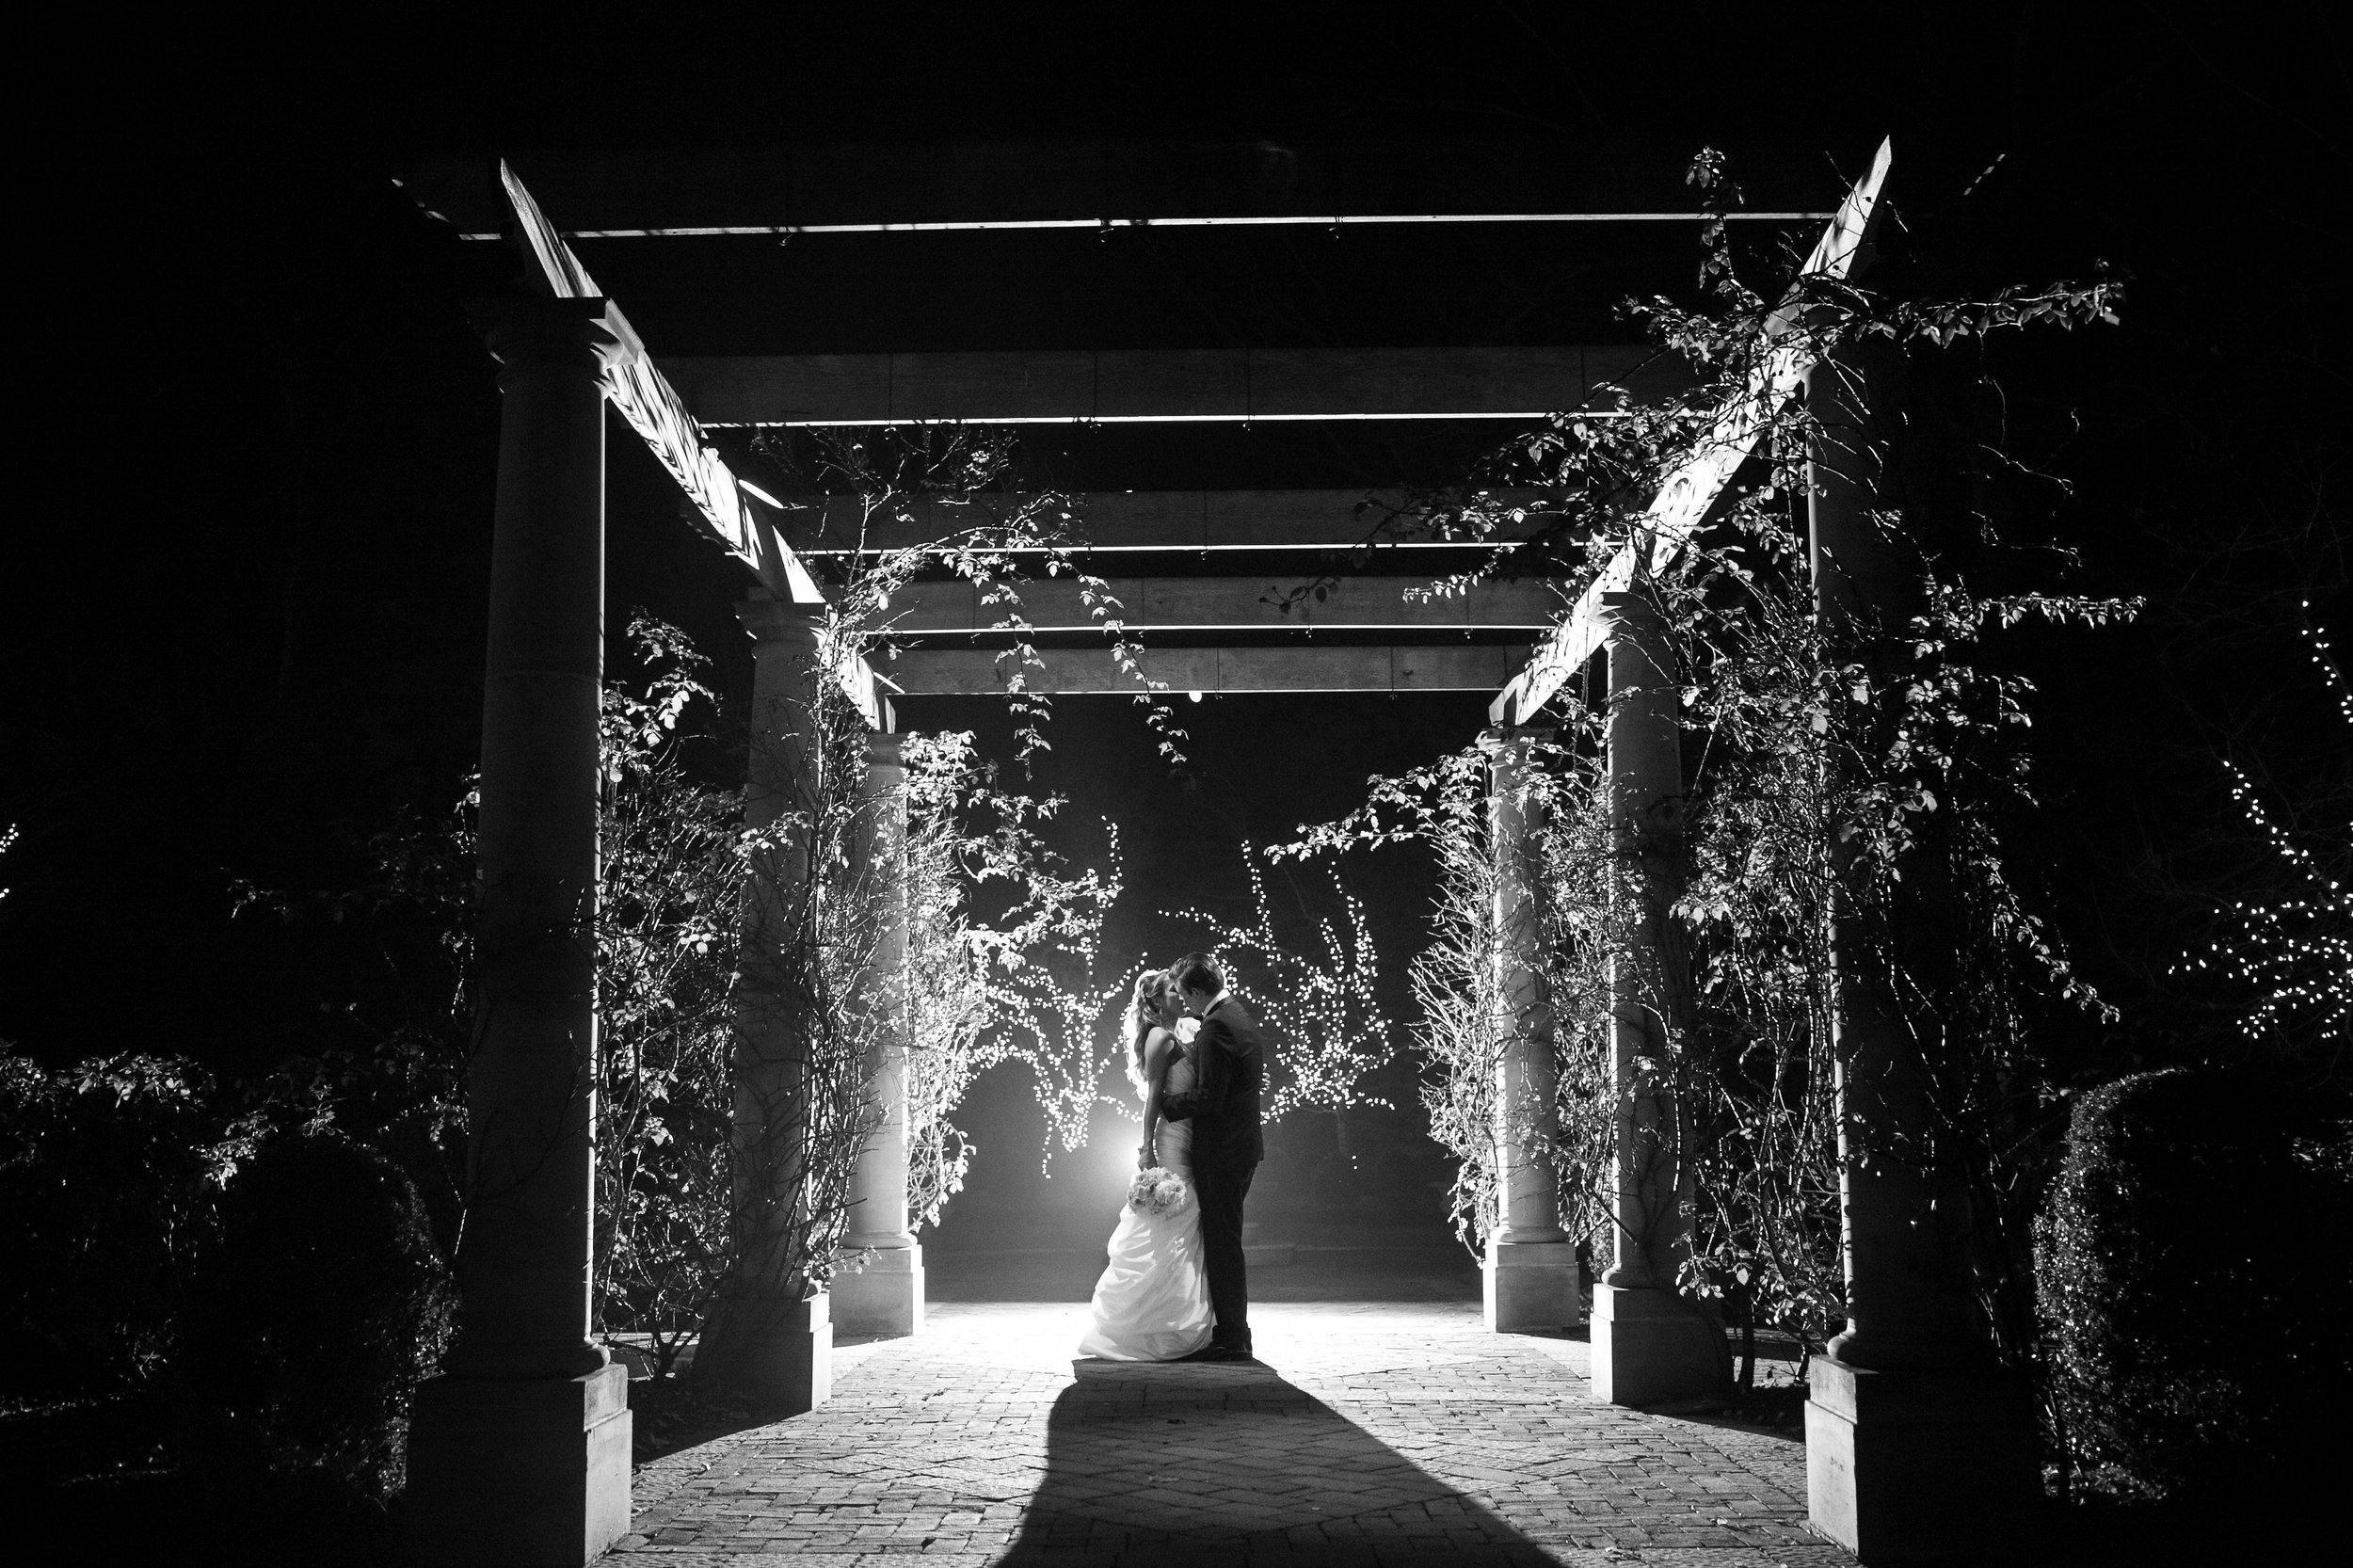 Ceci_New_York_Custom_Invitation_ New_Jersey_Wedding_Luxury_Personalized_Ceci_Style_Bride_Foil_Stamping175.JPG